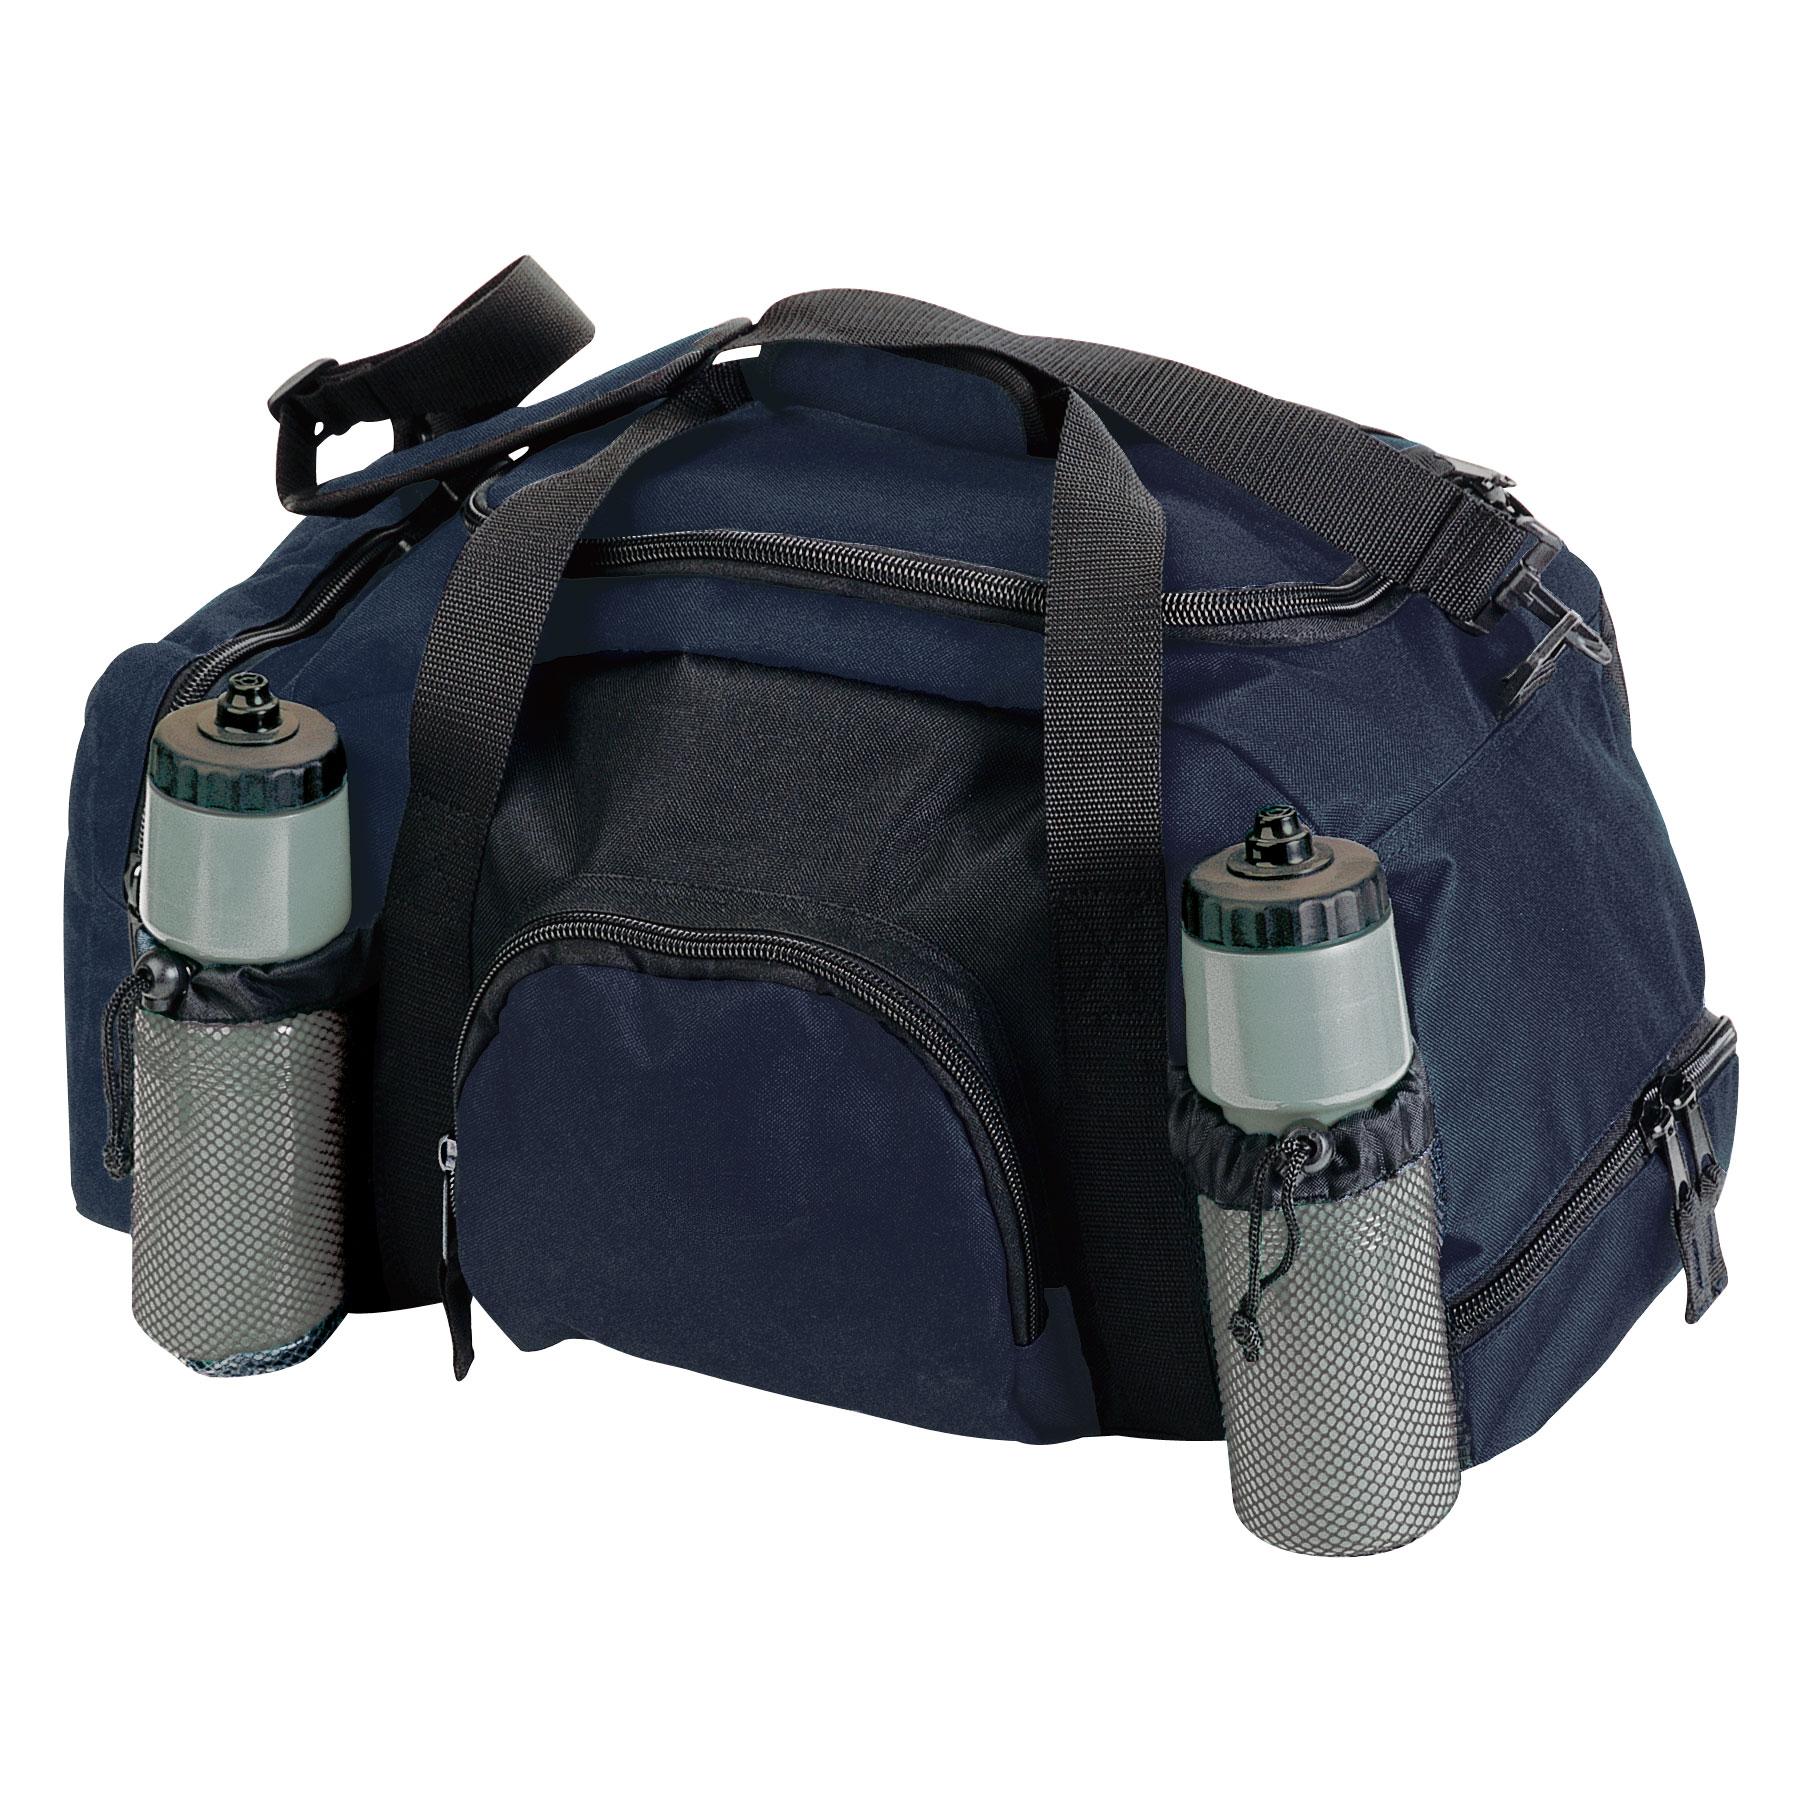 Road Trip Sports Bag The Catalogue